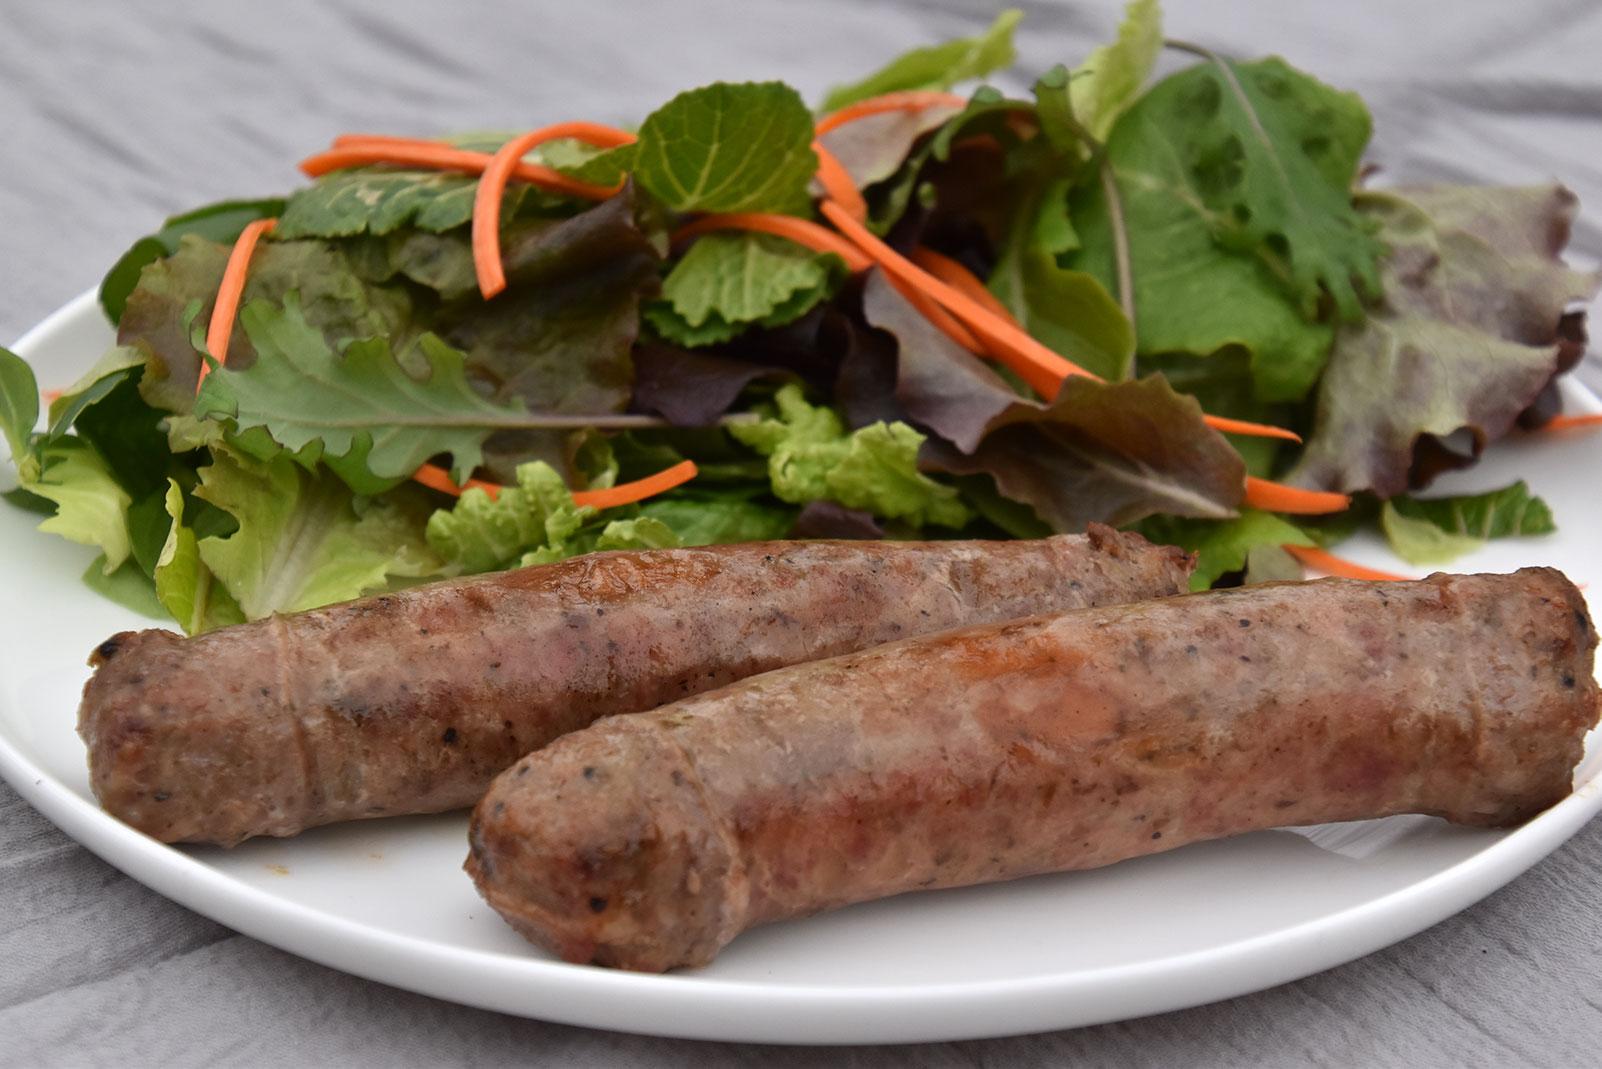 indiana-pasture-raised-sausage.jpg